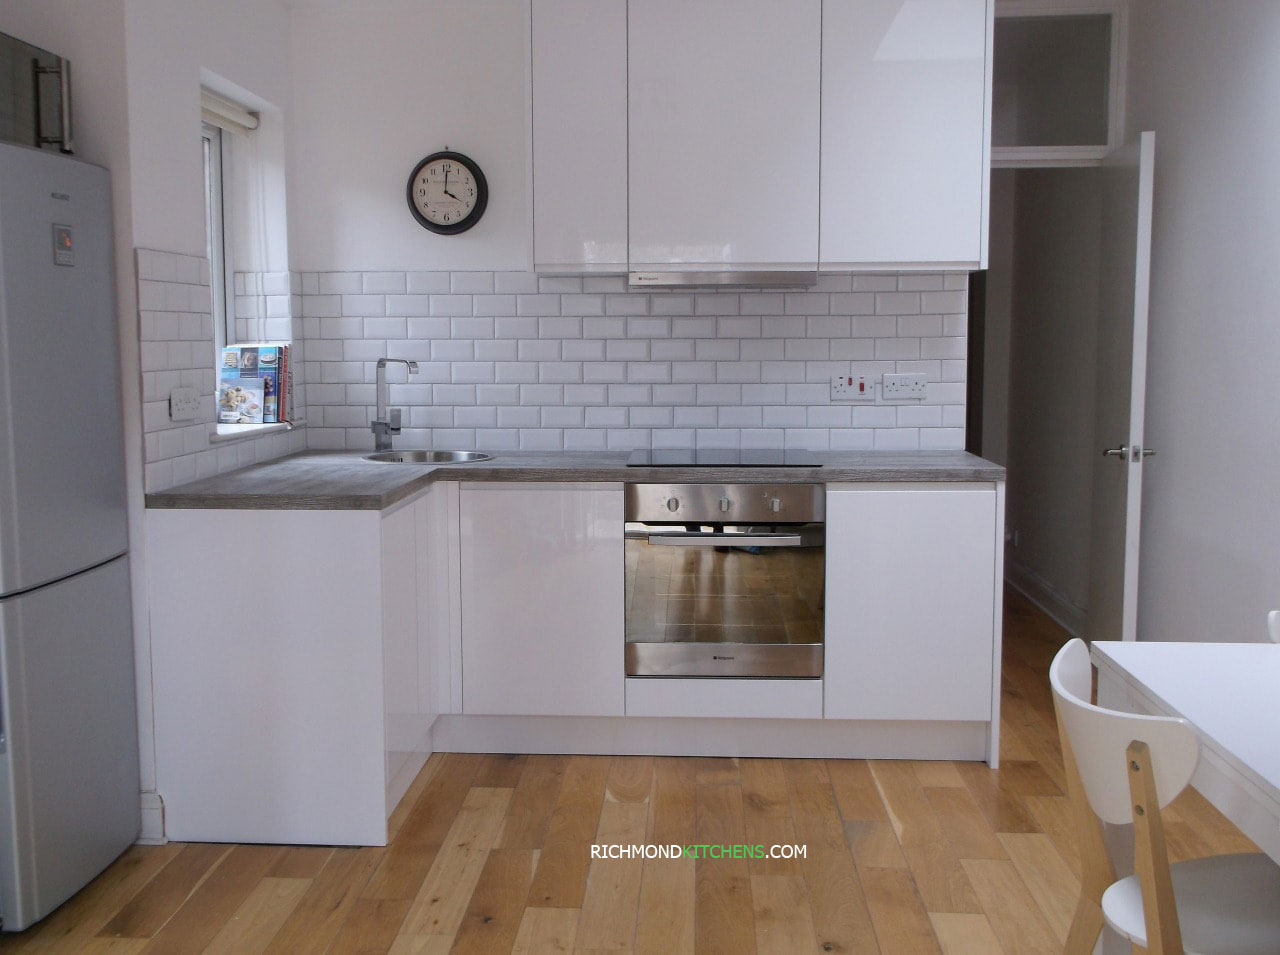 Kitchen Showroom surrey Surbiton